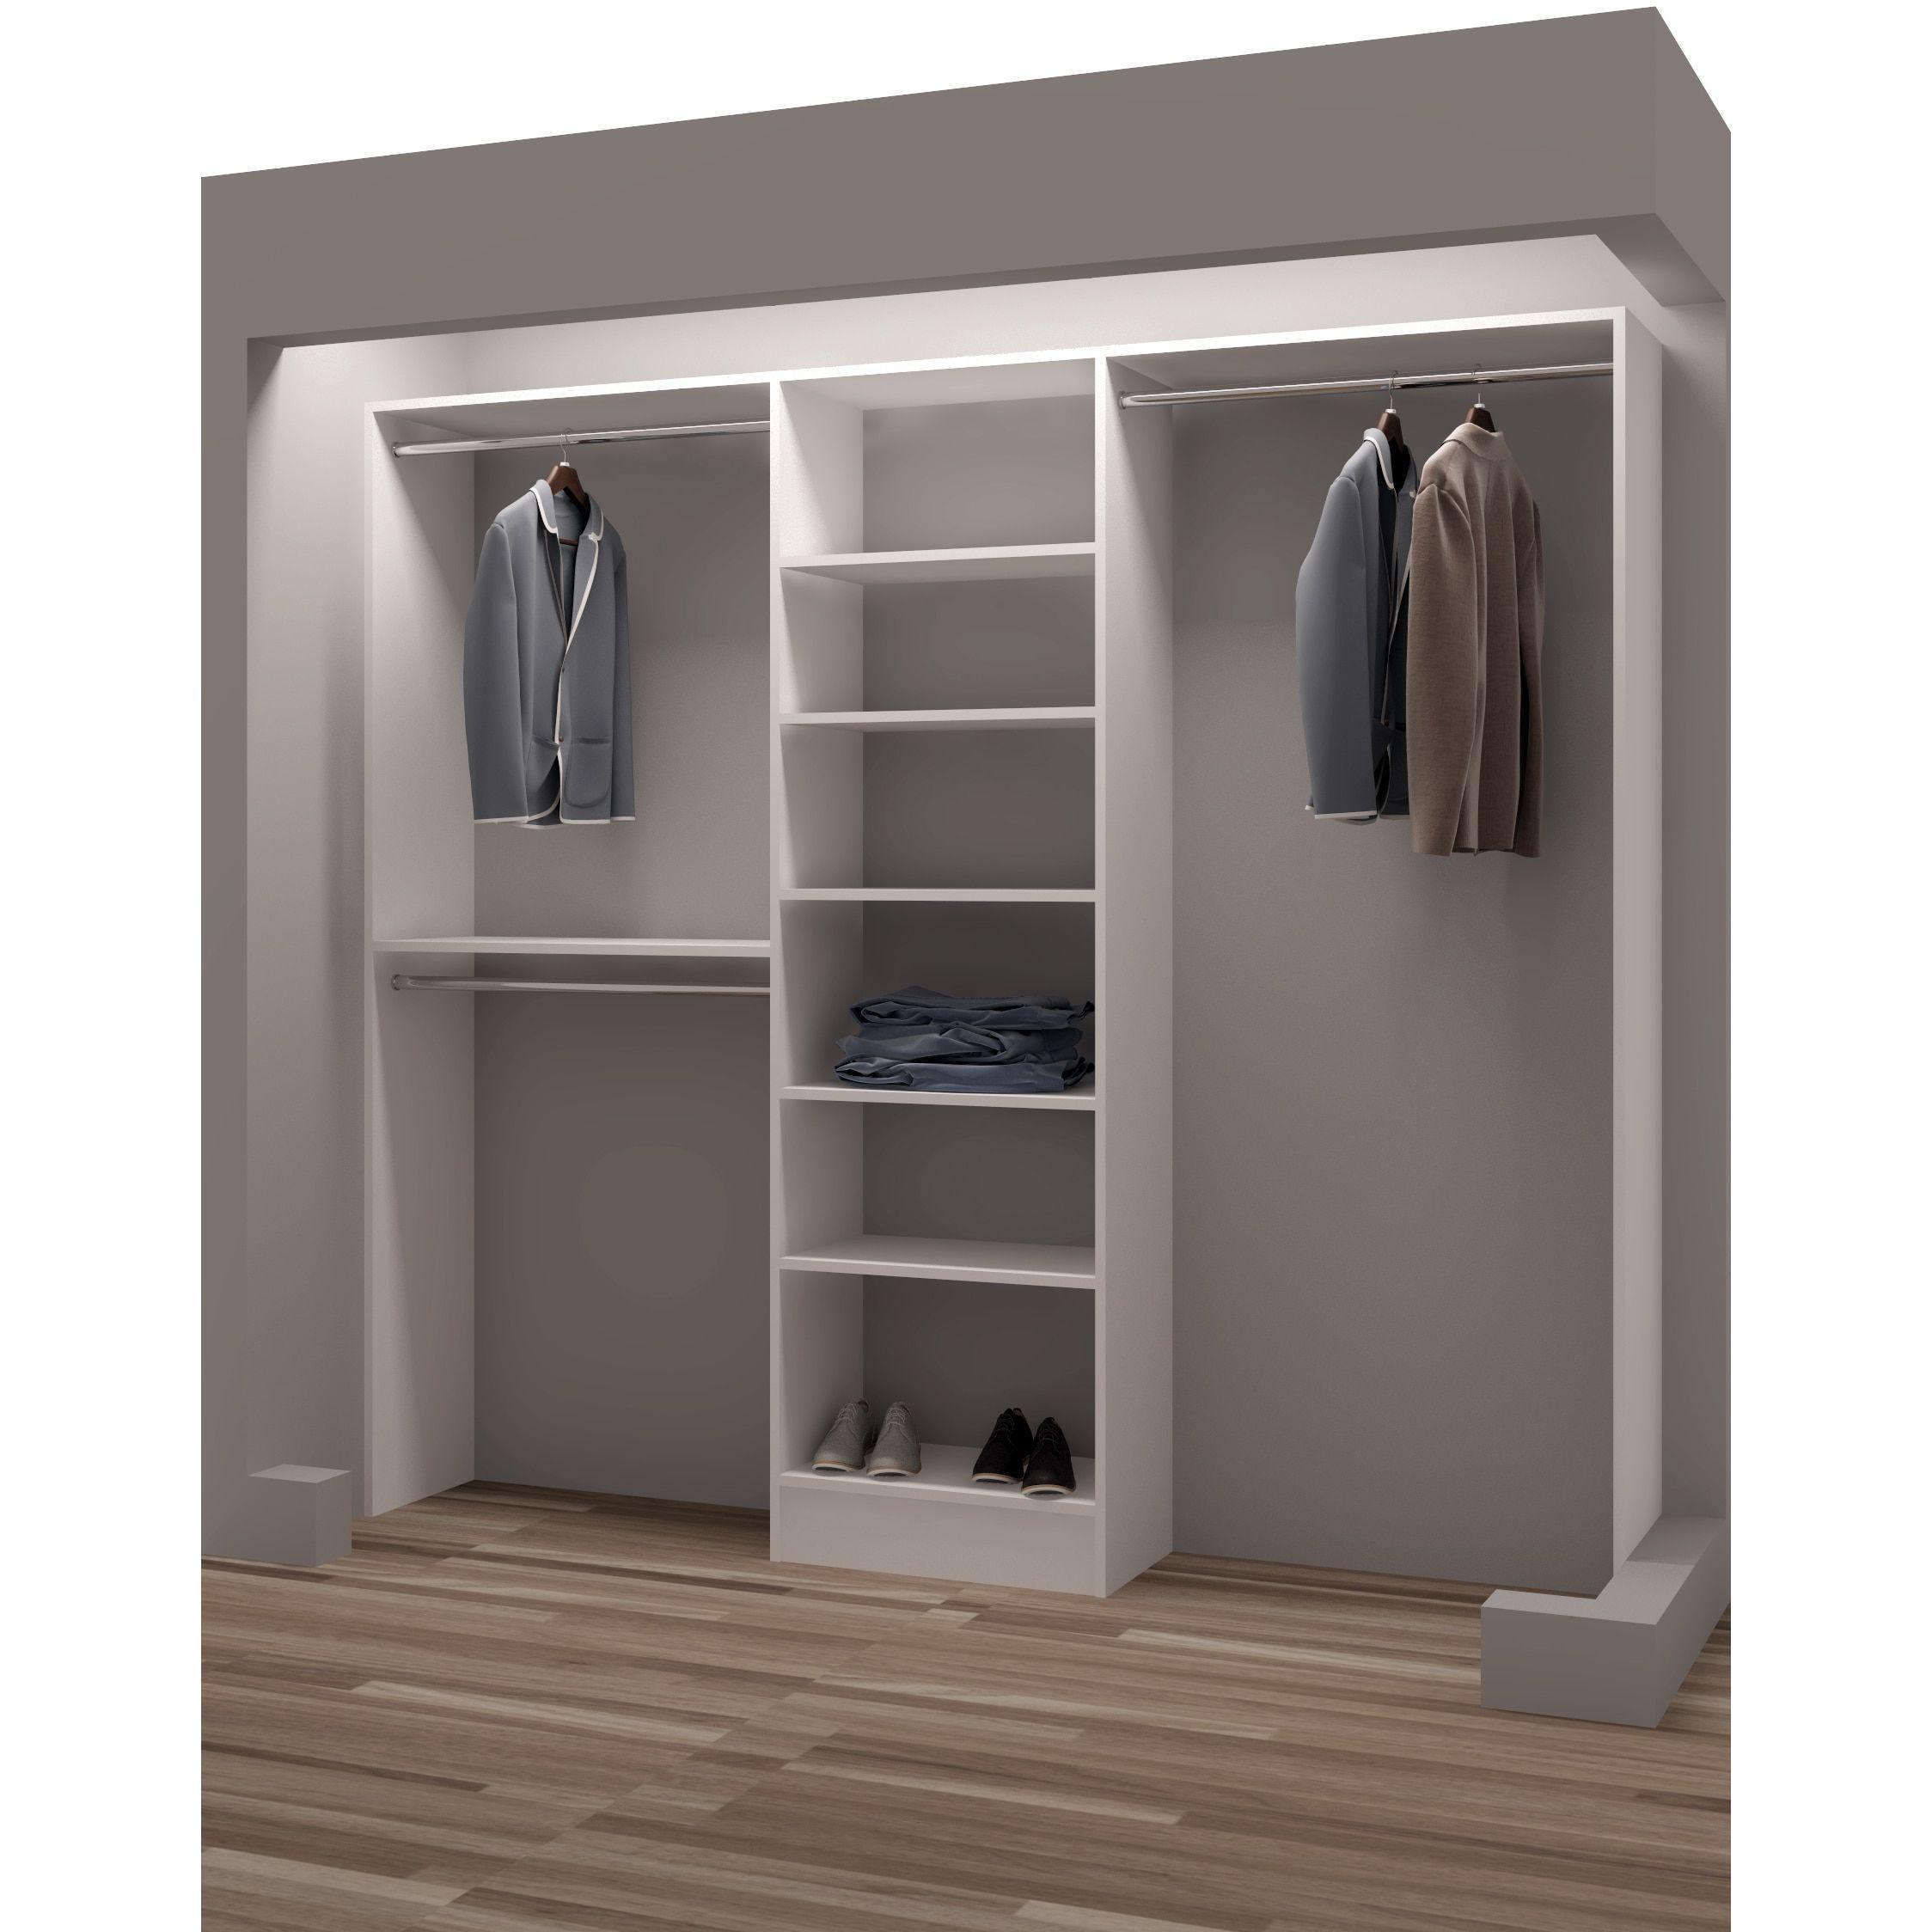 Tidysquares White Wood 93 Reach In Closet Organizer Closet